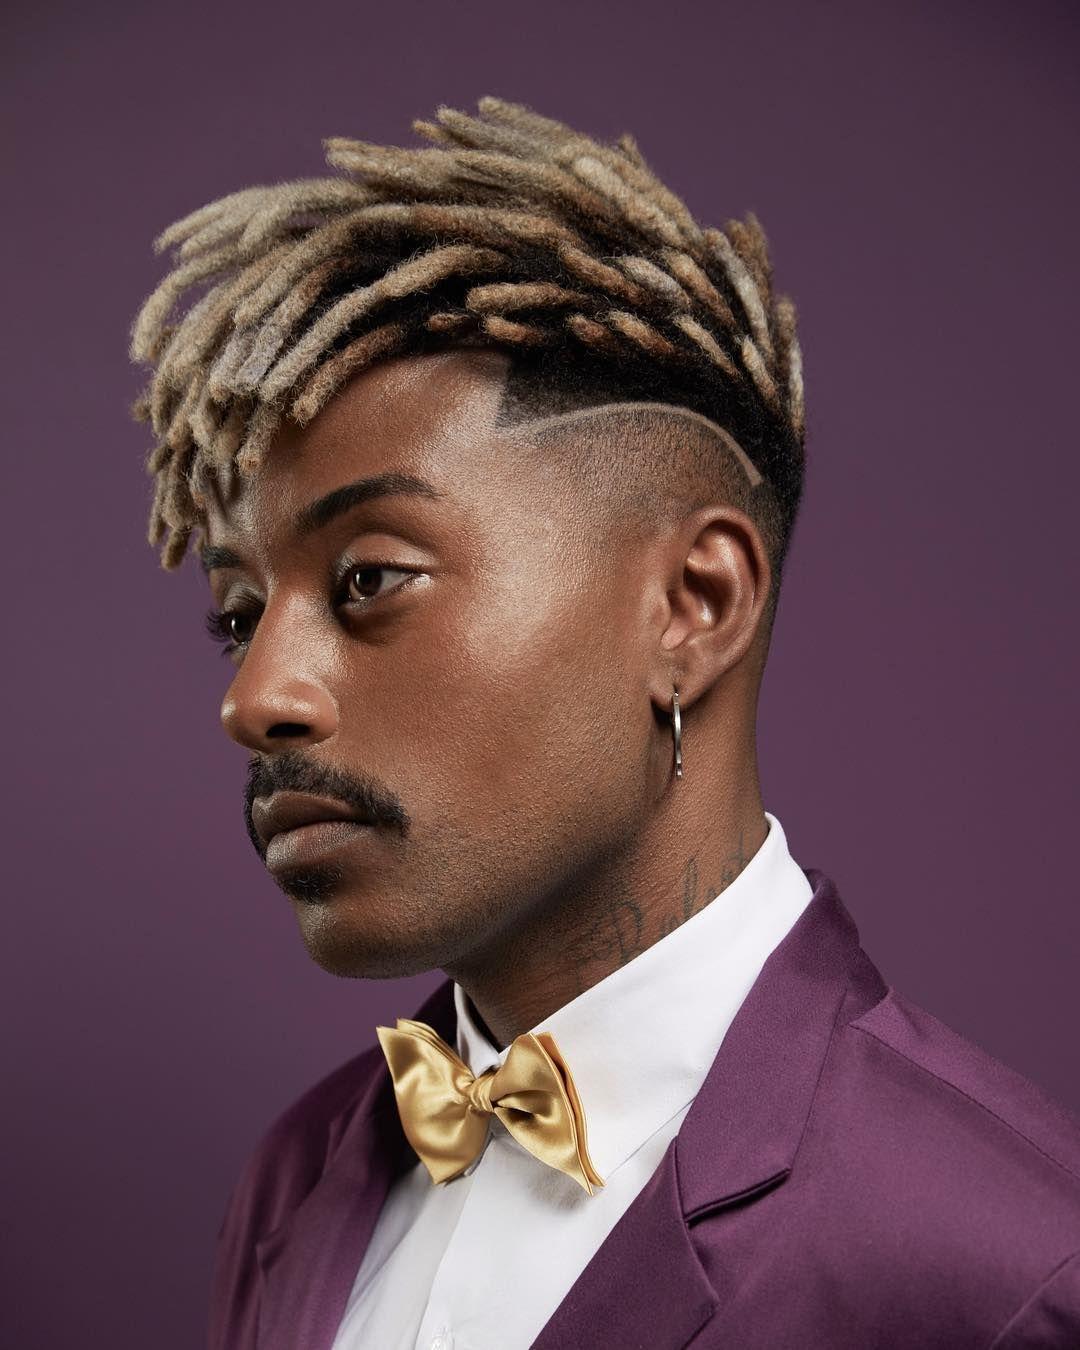 20 cool haircuts for men 2020 styles dreadlock